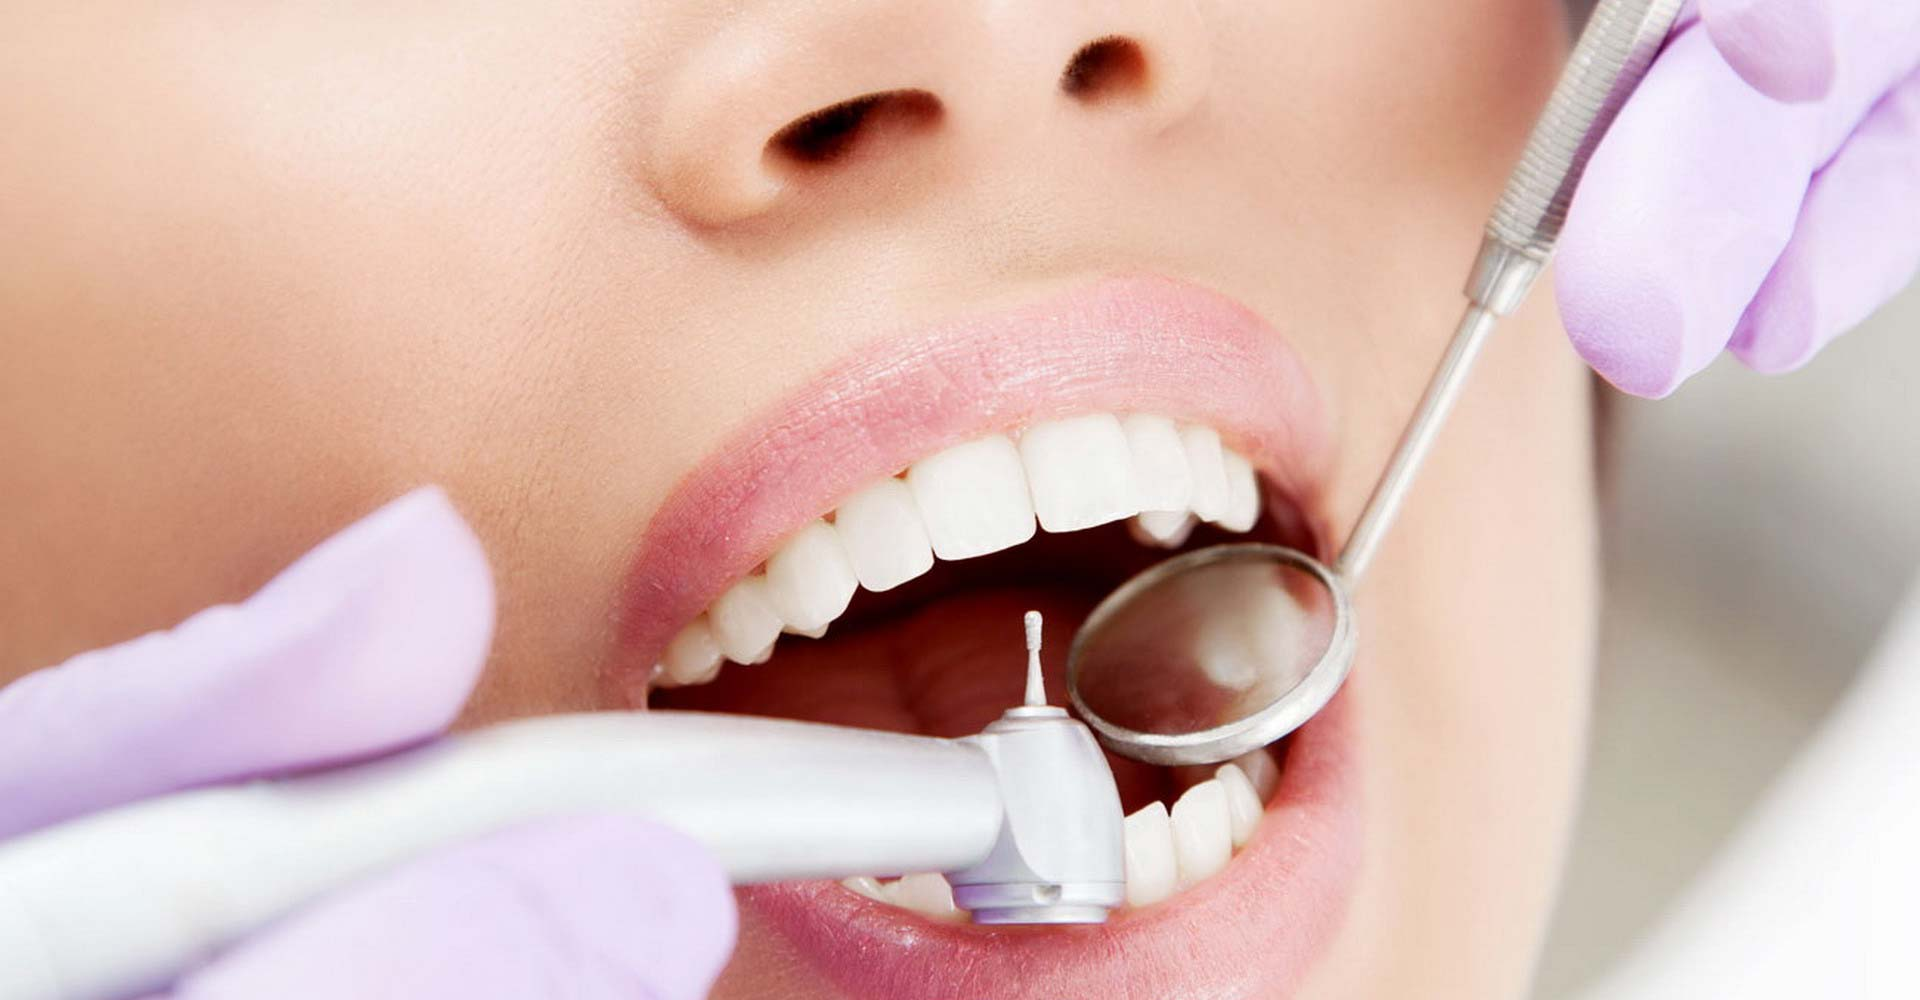 Odontoiatra Ferrara Dentista Ferrara Studio Odontoiatrico Dott. Nicola Mobilio Prestazioni - Odontoiatria Conservativa